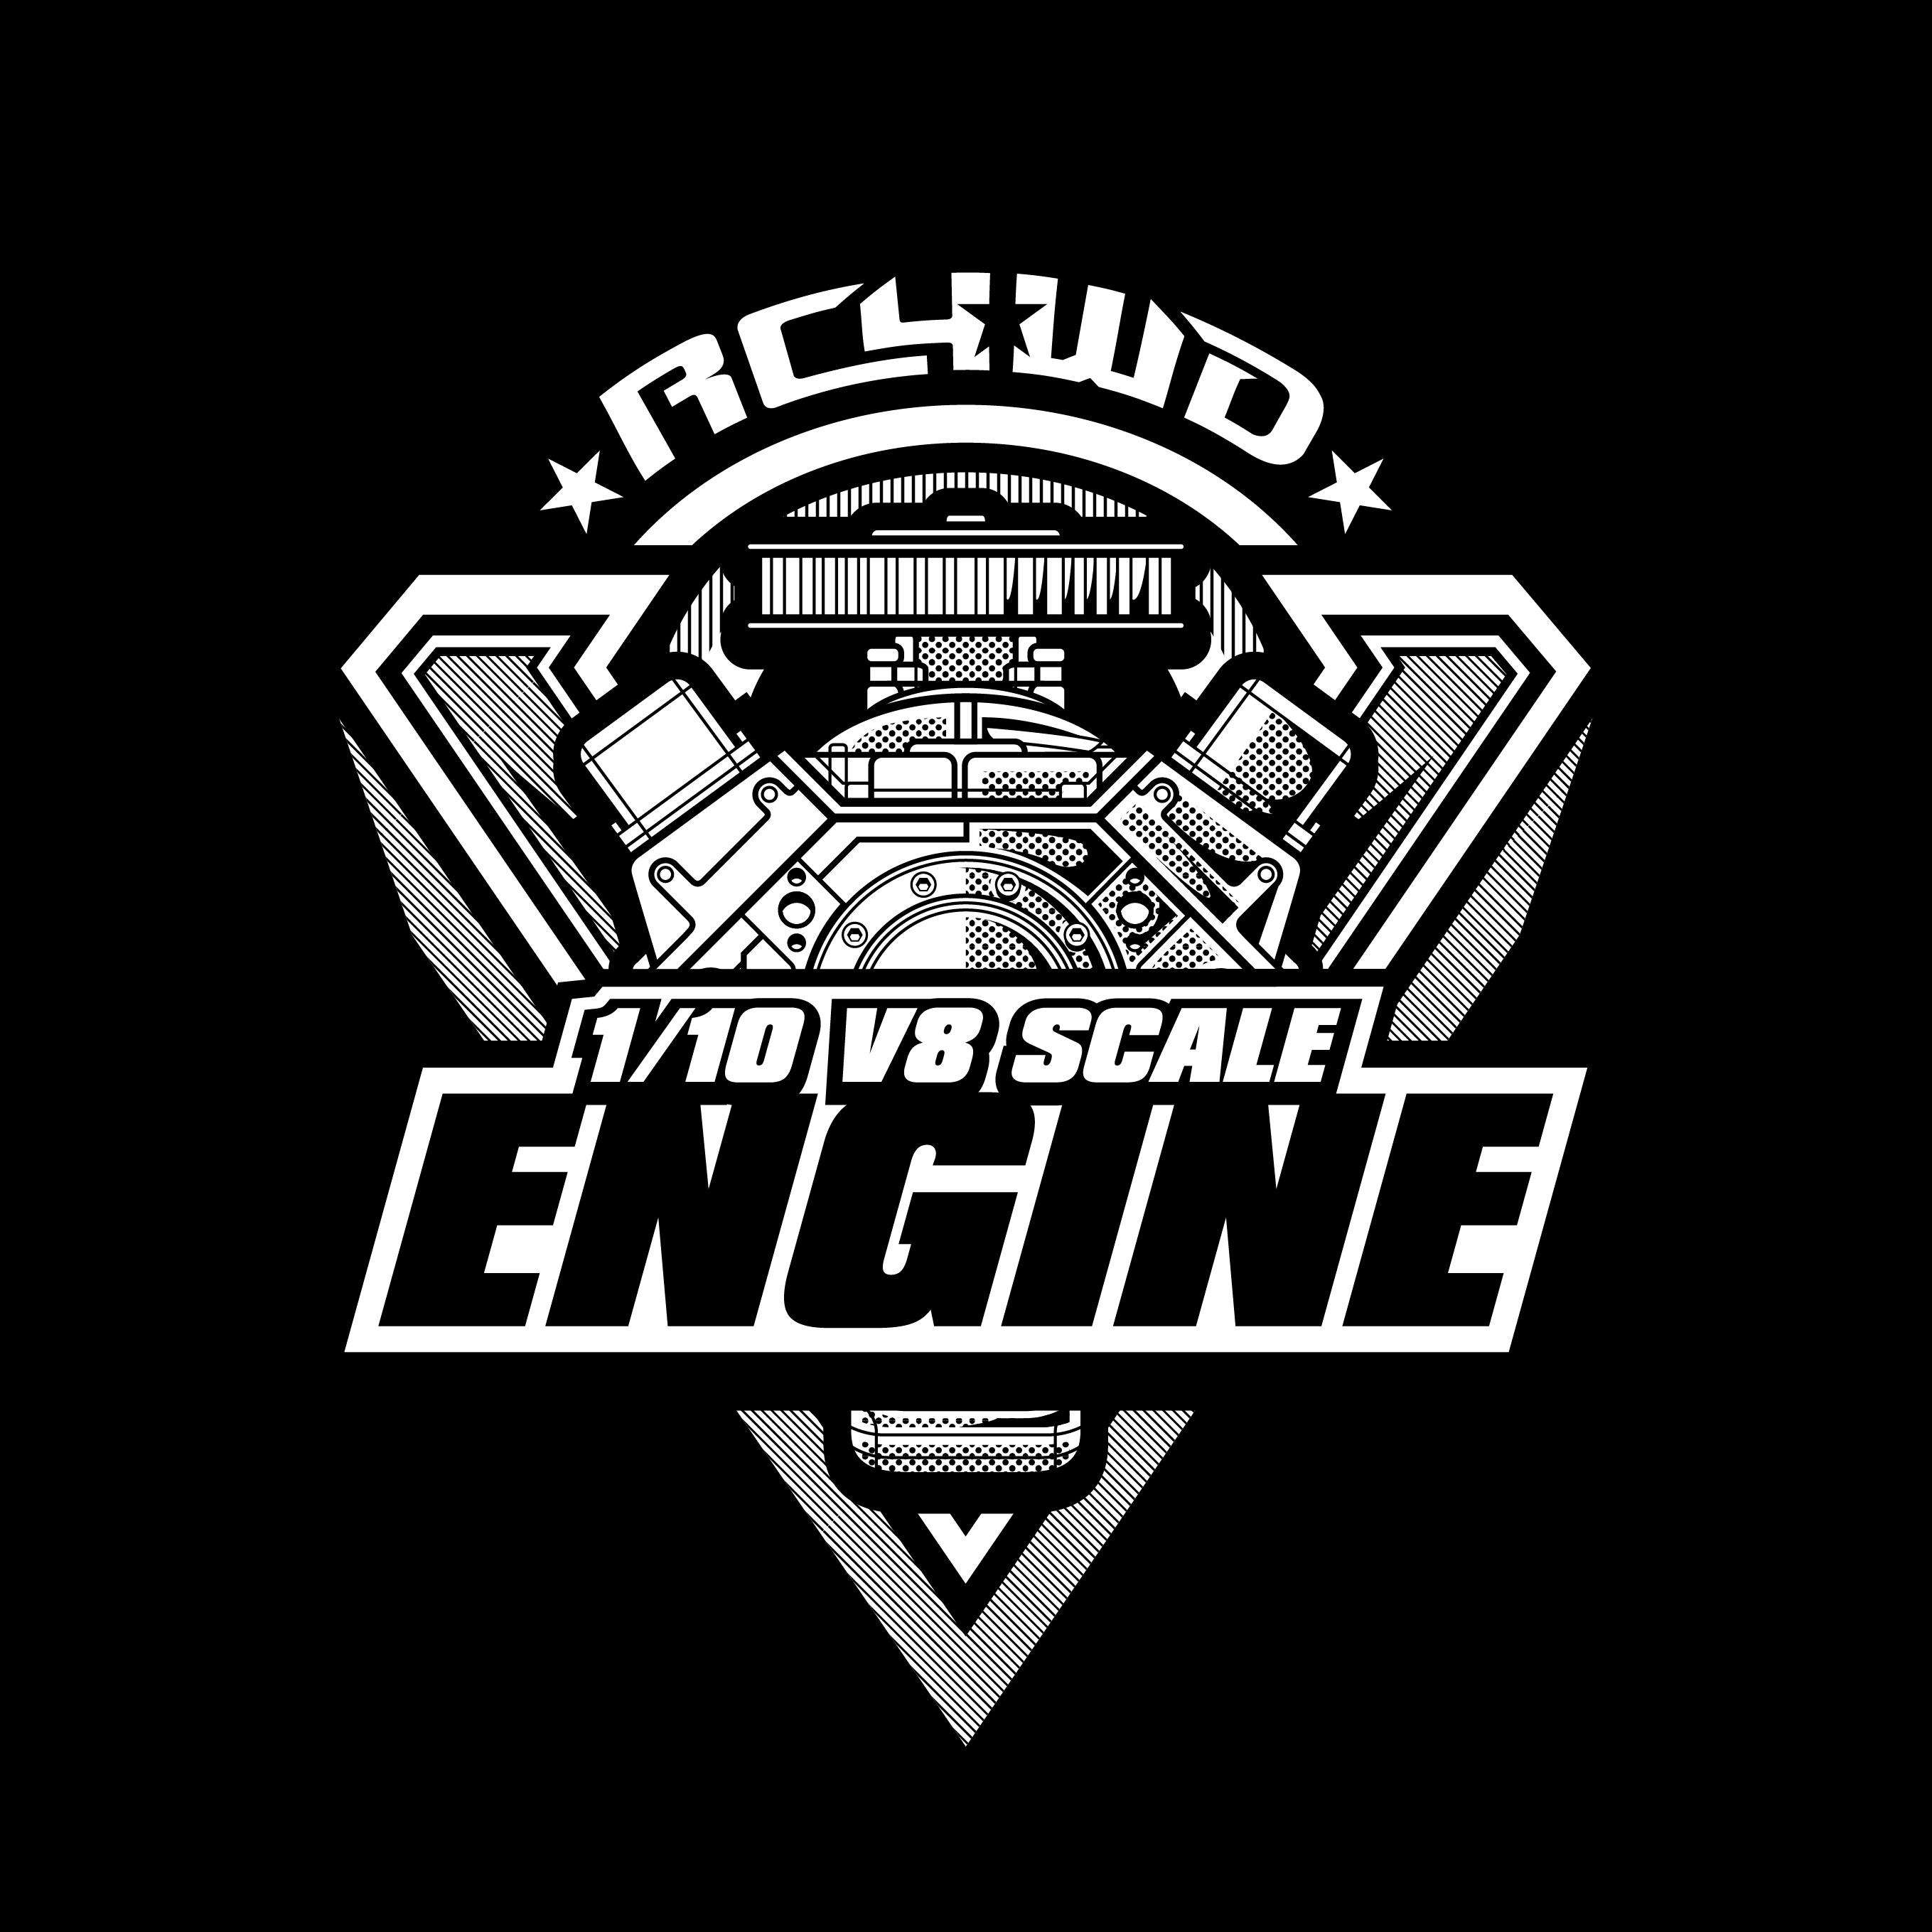 https://www.killercase.com/product/V8%20Scale%20Engine/V8%20Scale%20Engine%20B_2.png